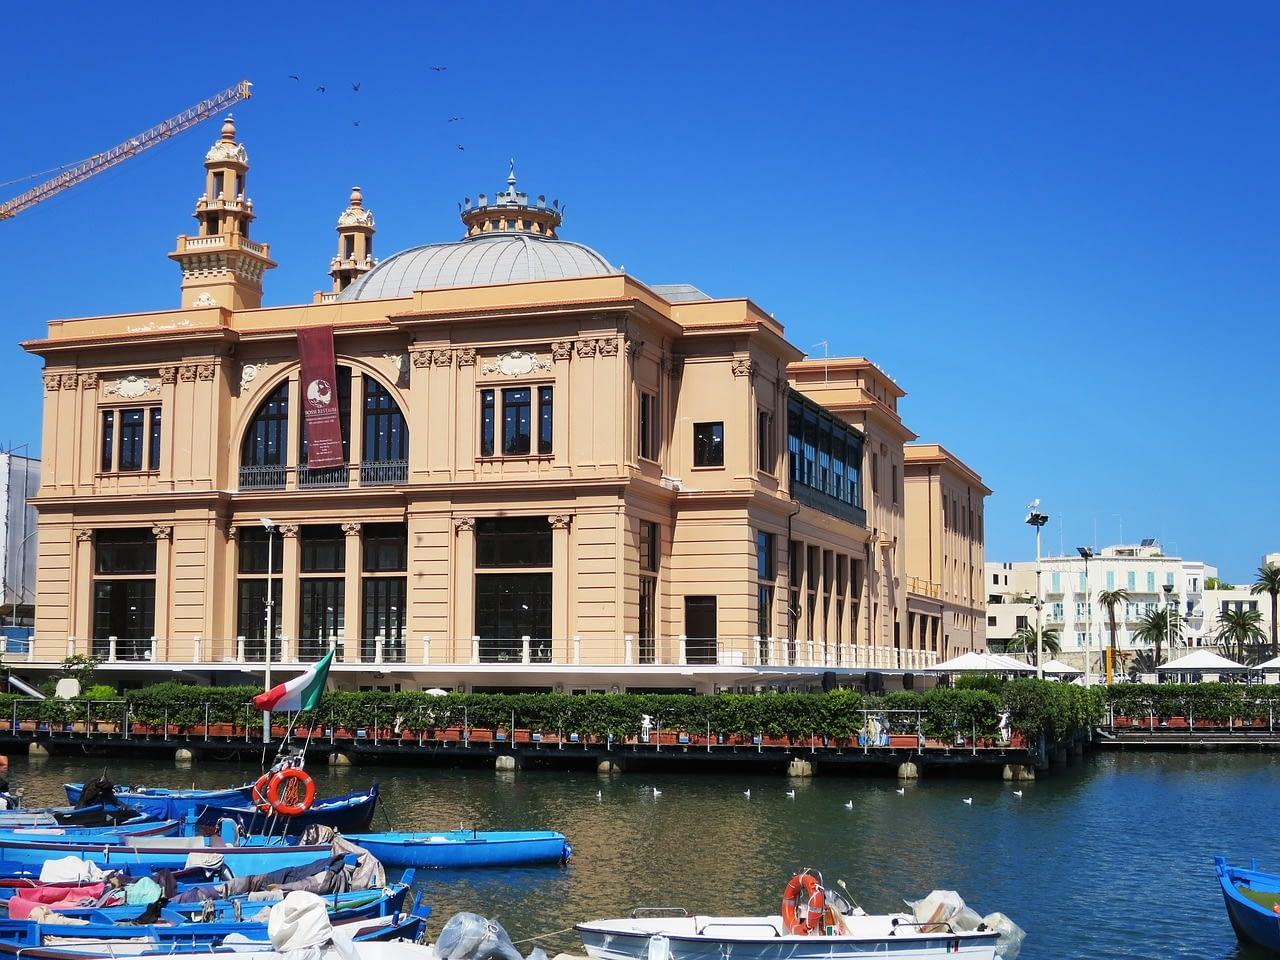 Bari, main city of Puglia